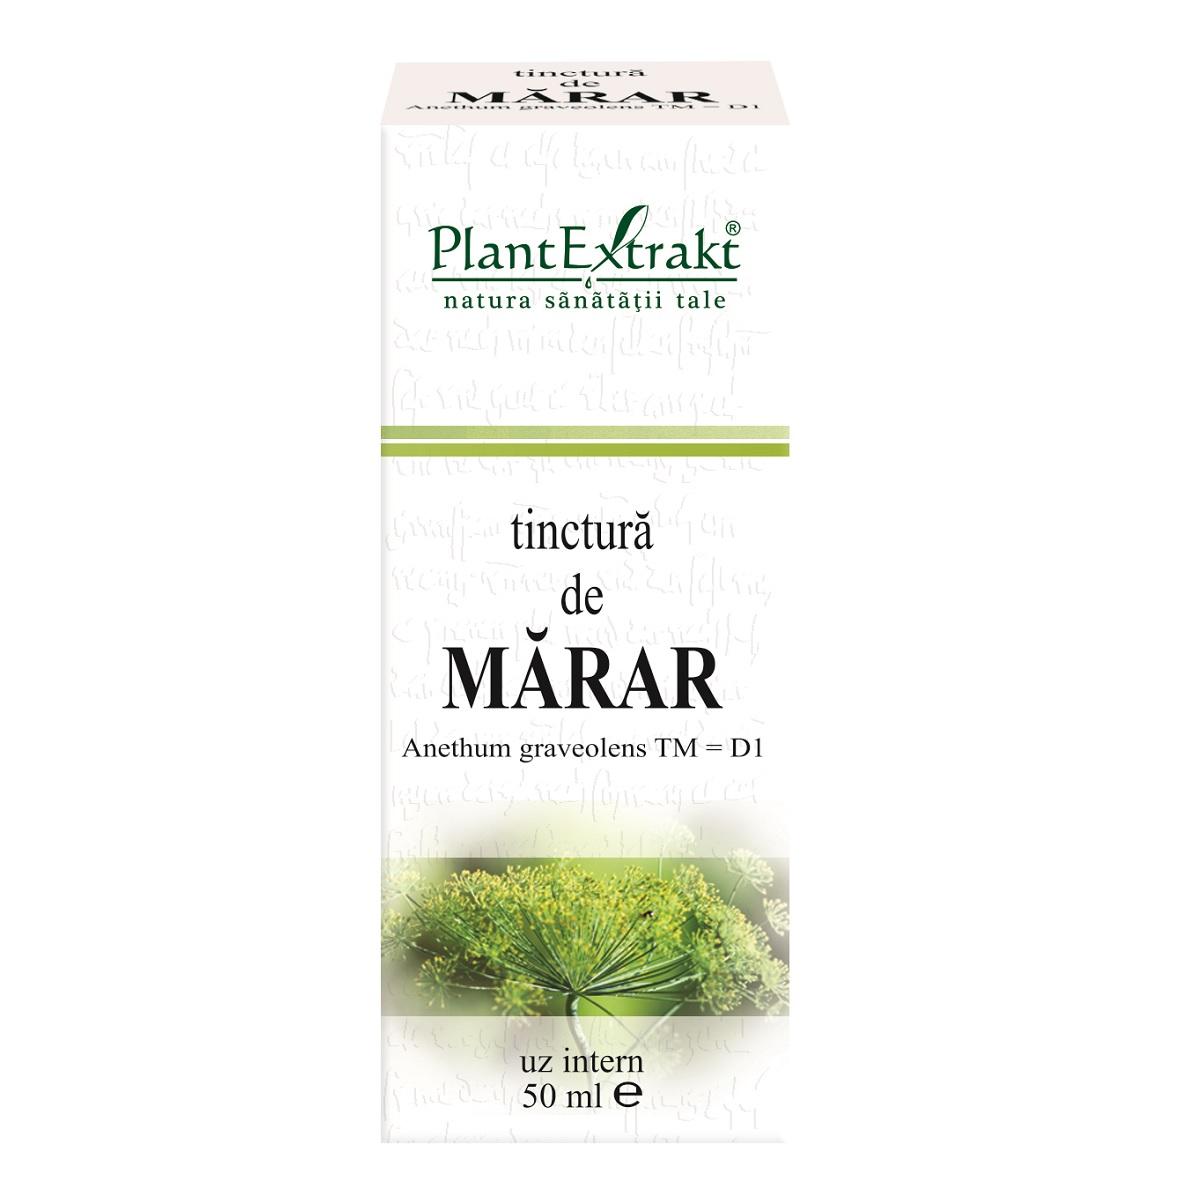 Tinctura de Marar, 50ml, PlantExtrakt imagine produs 2021